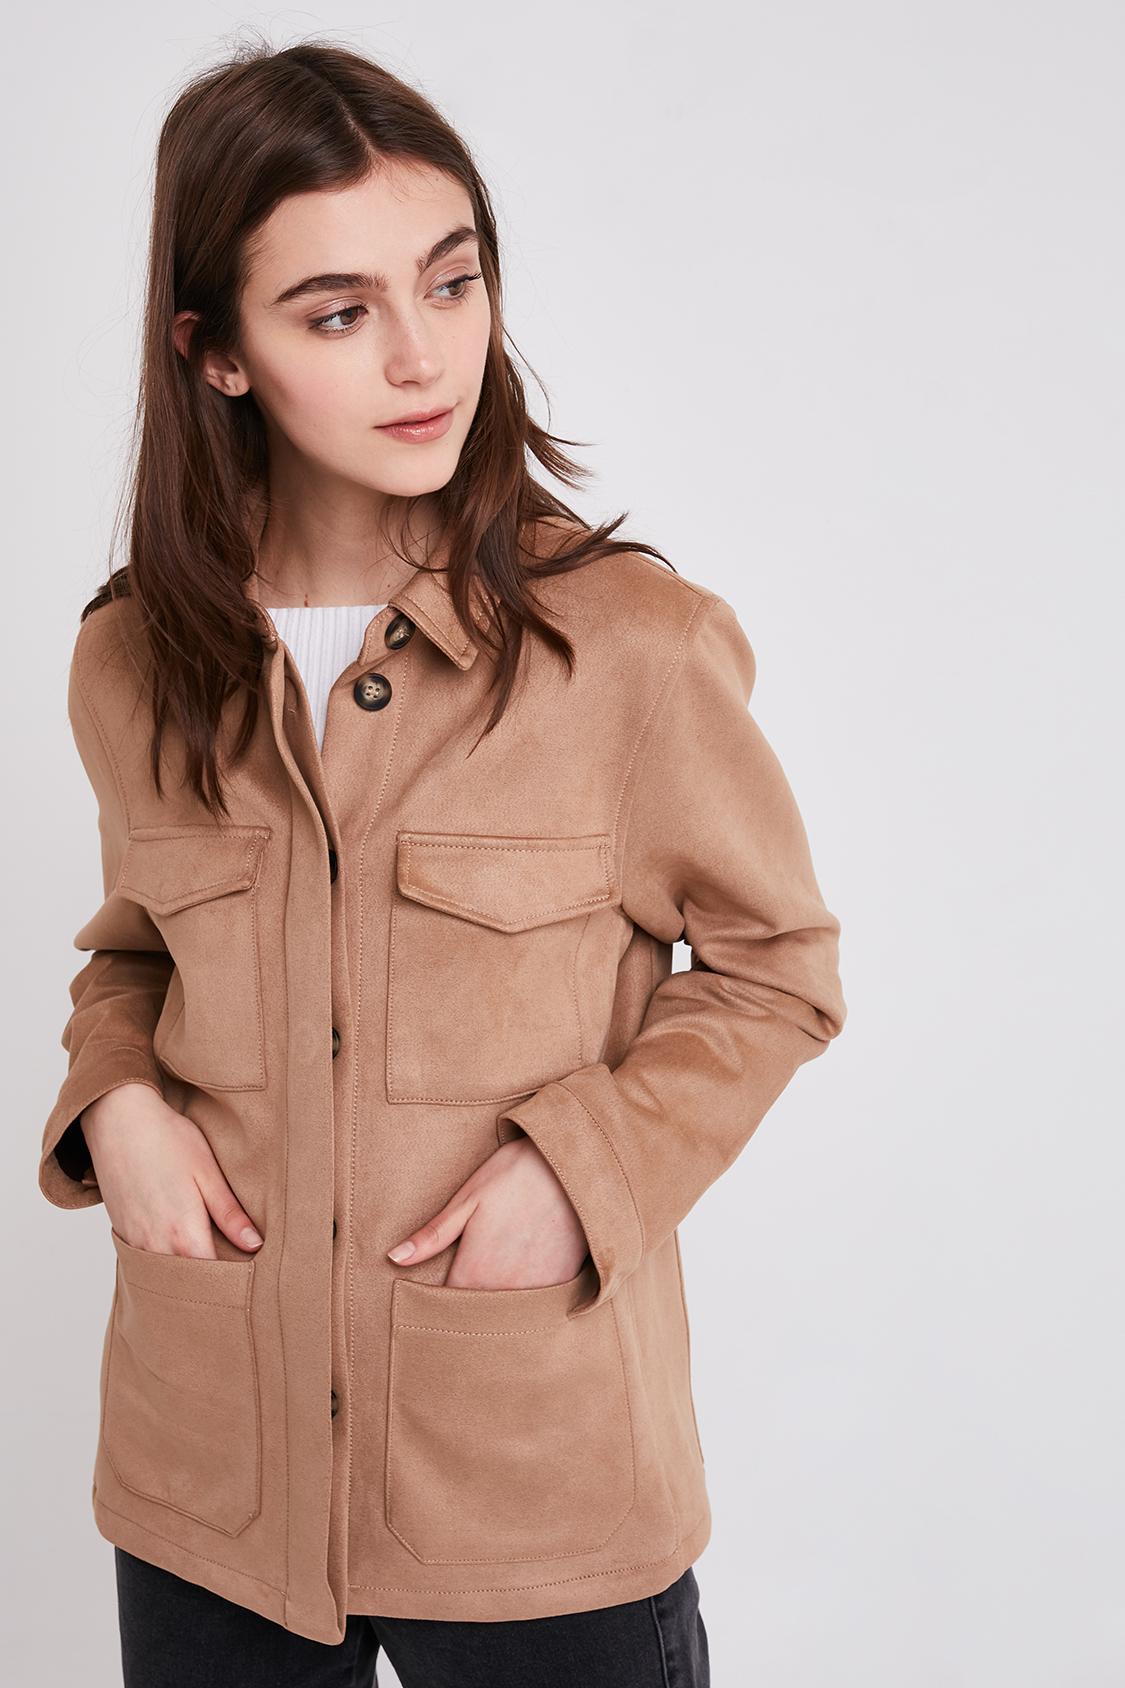 Suede effect jacket